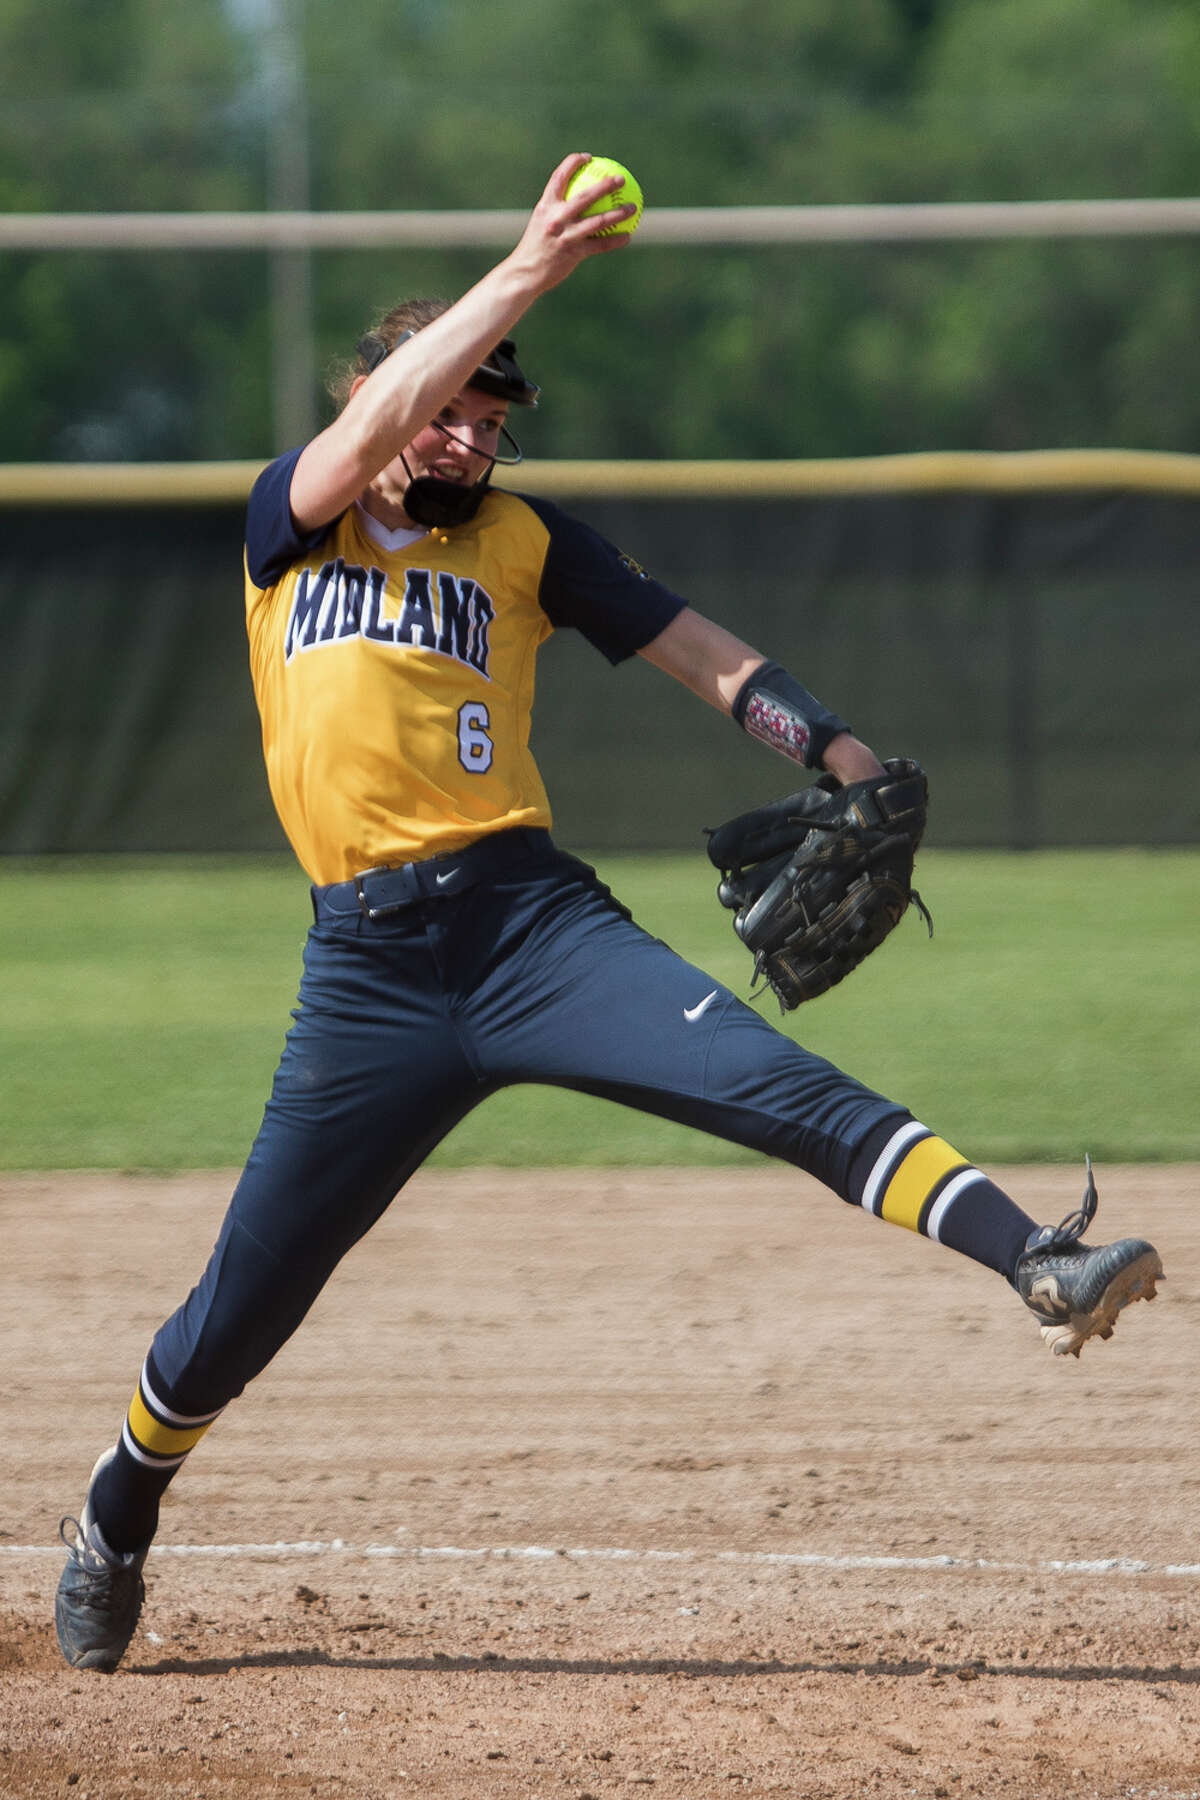 Midland's Rachel Mecca pitches the ball during a game against Bullock Creek Monday, May 24, 2021 at Bullock Creek High School. (Katy Kildee/kkildee@mdn.net)